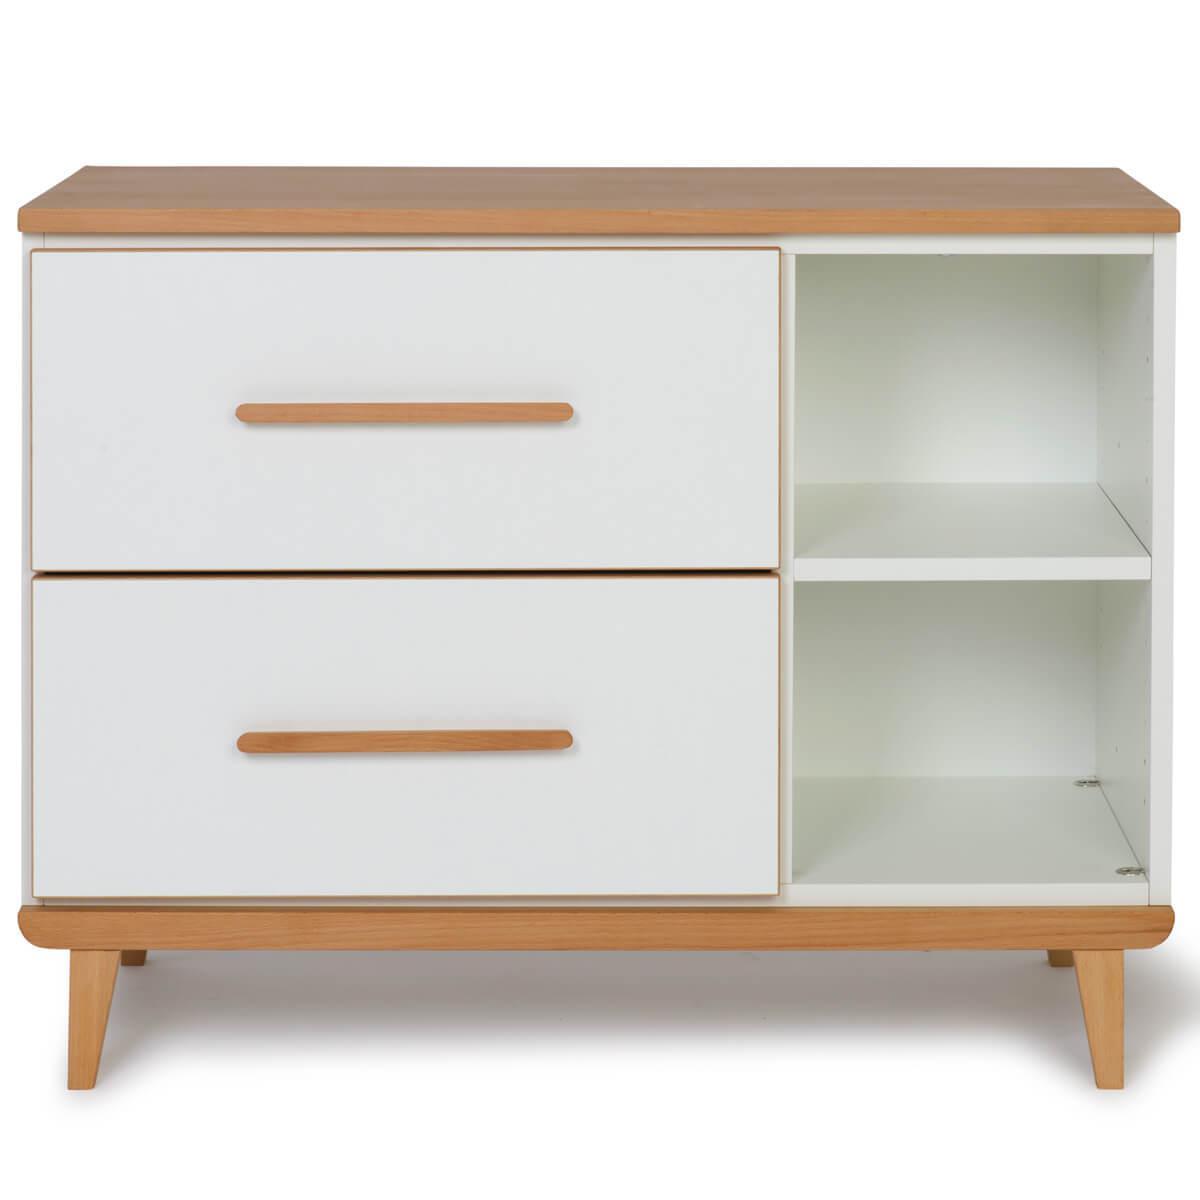 Wookids - Petit meuble 2 tiroirs NADO white